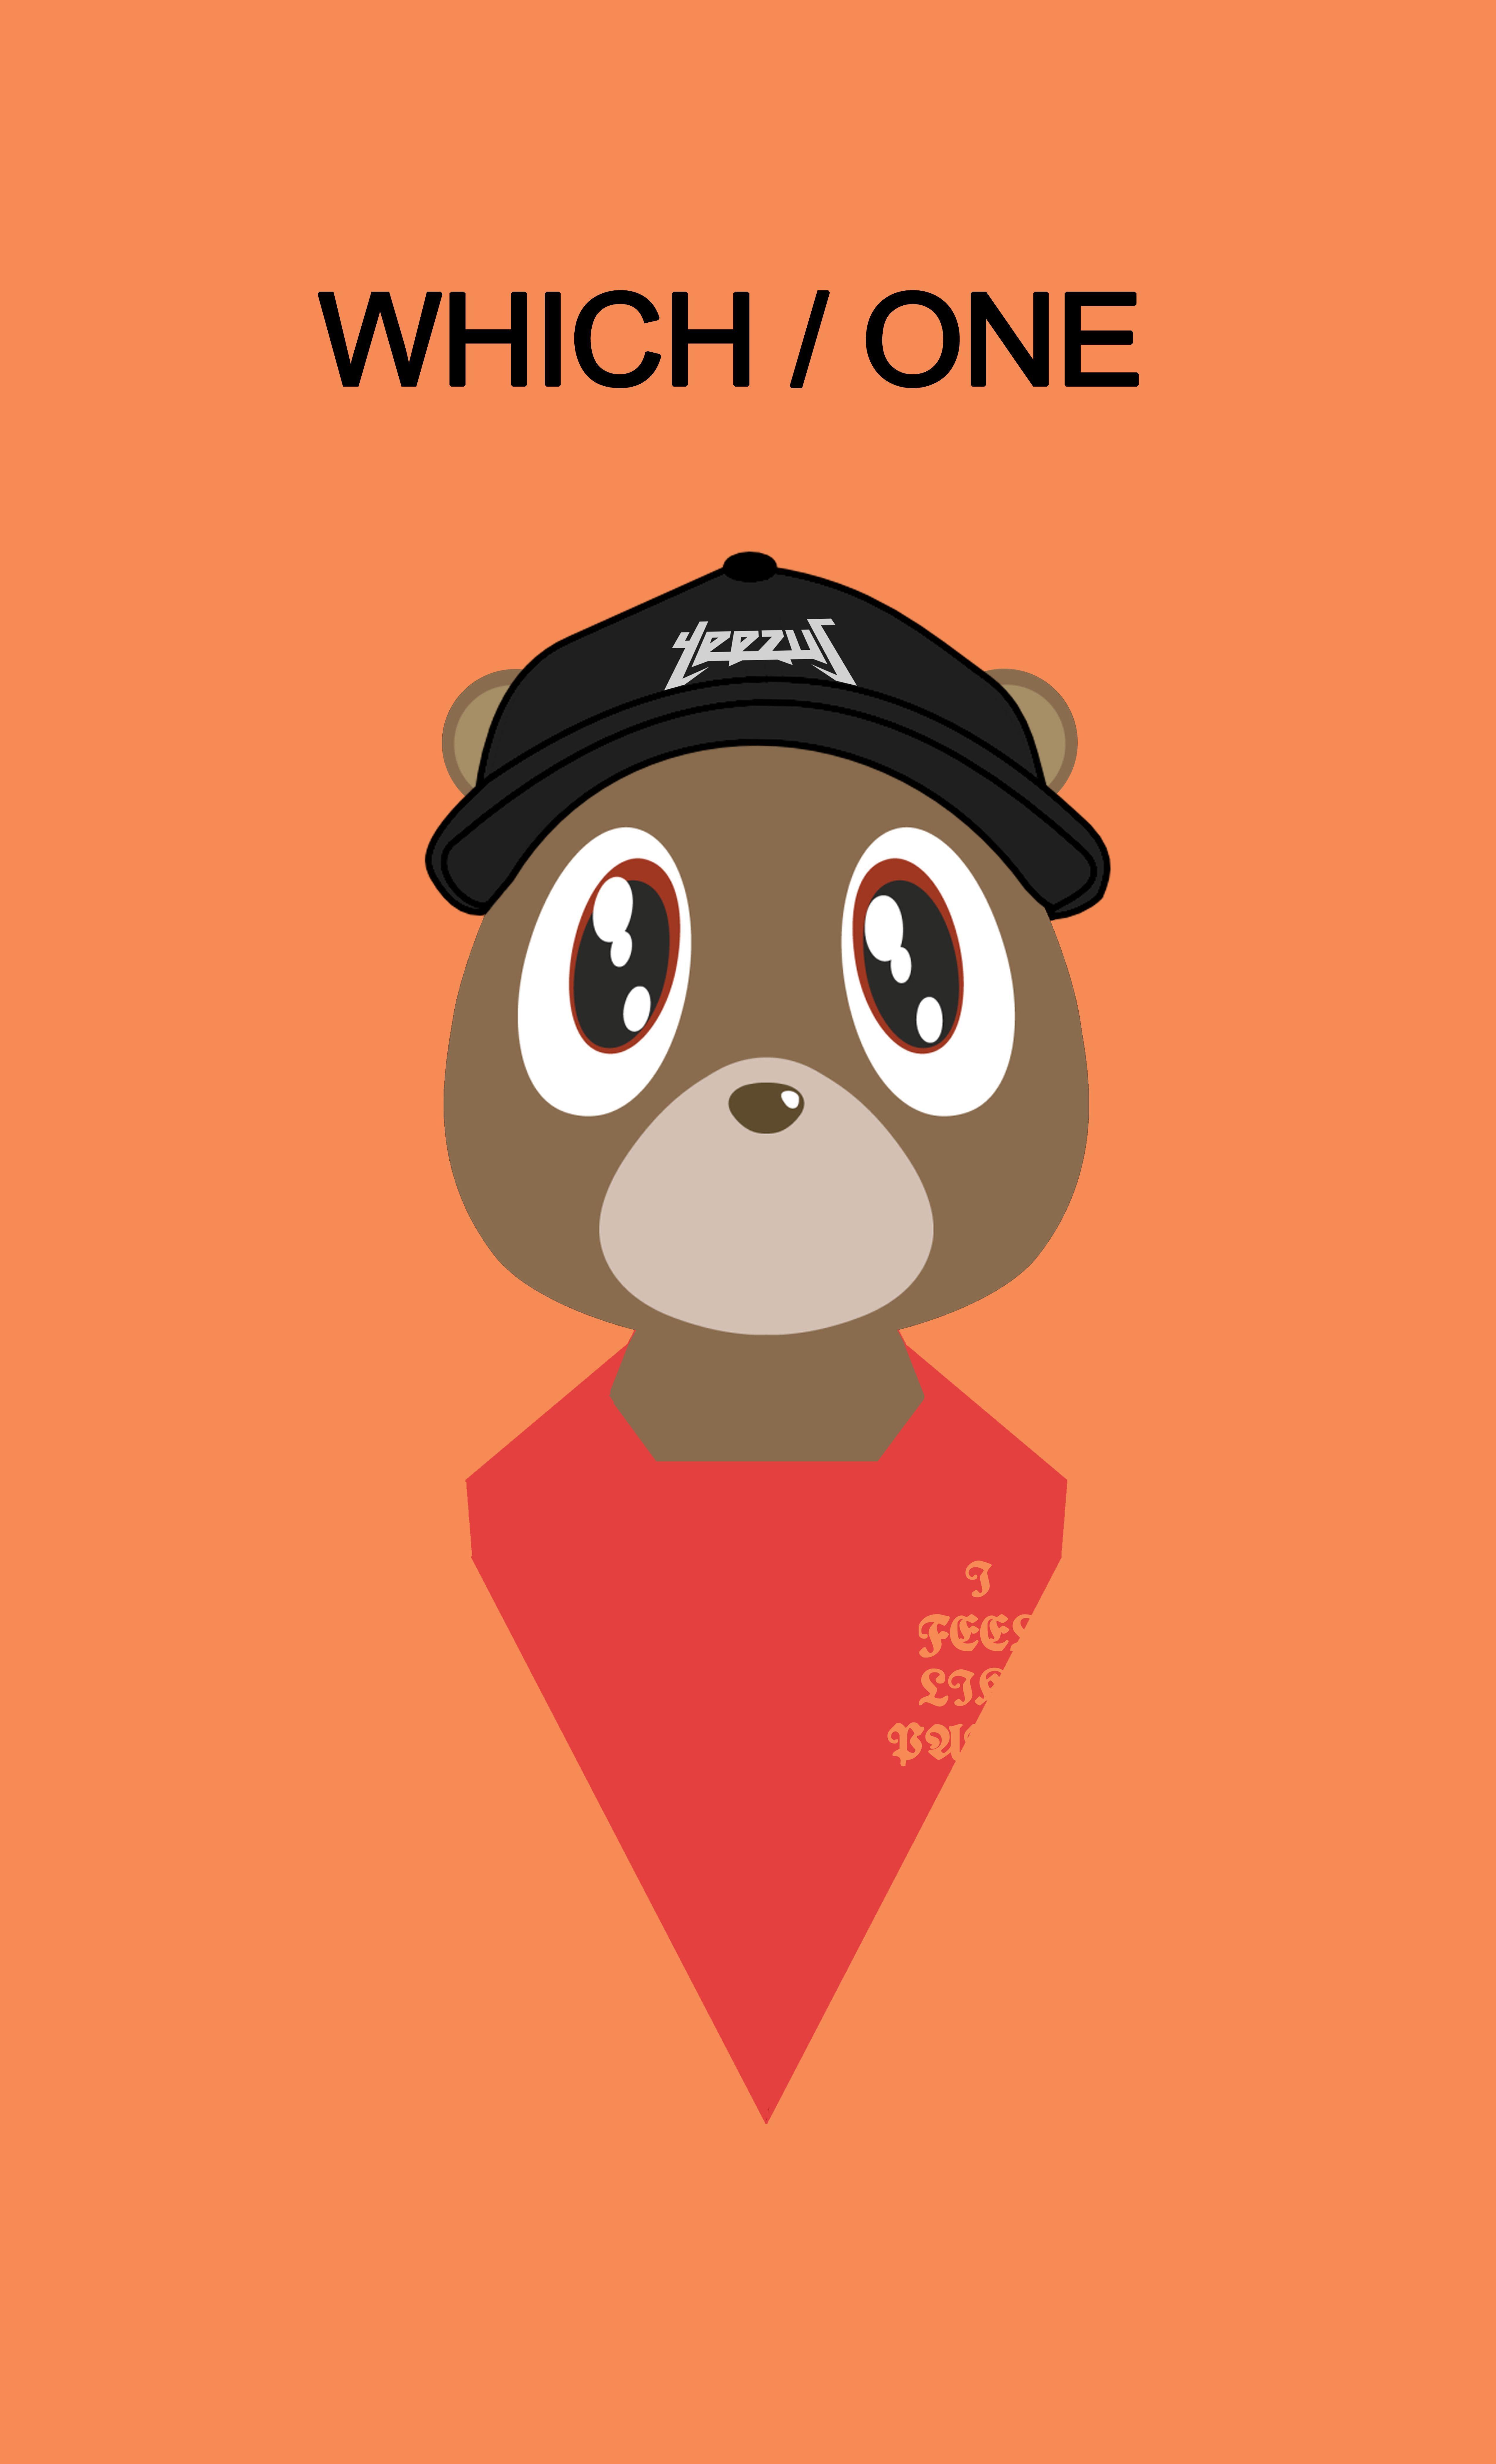 Iphone 11 Wallpaper Iphone 11 Wallpaper Kanye